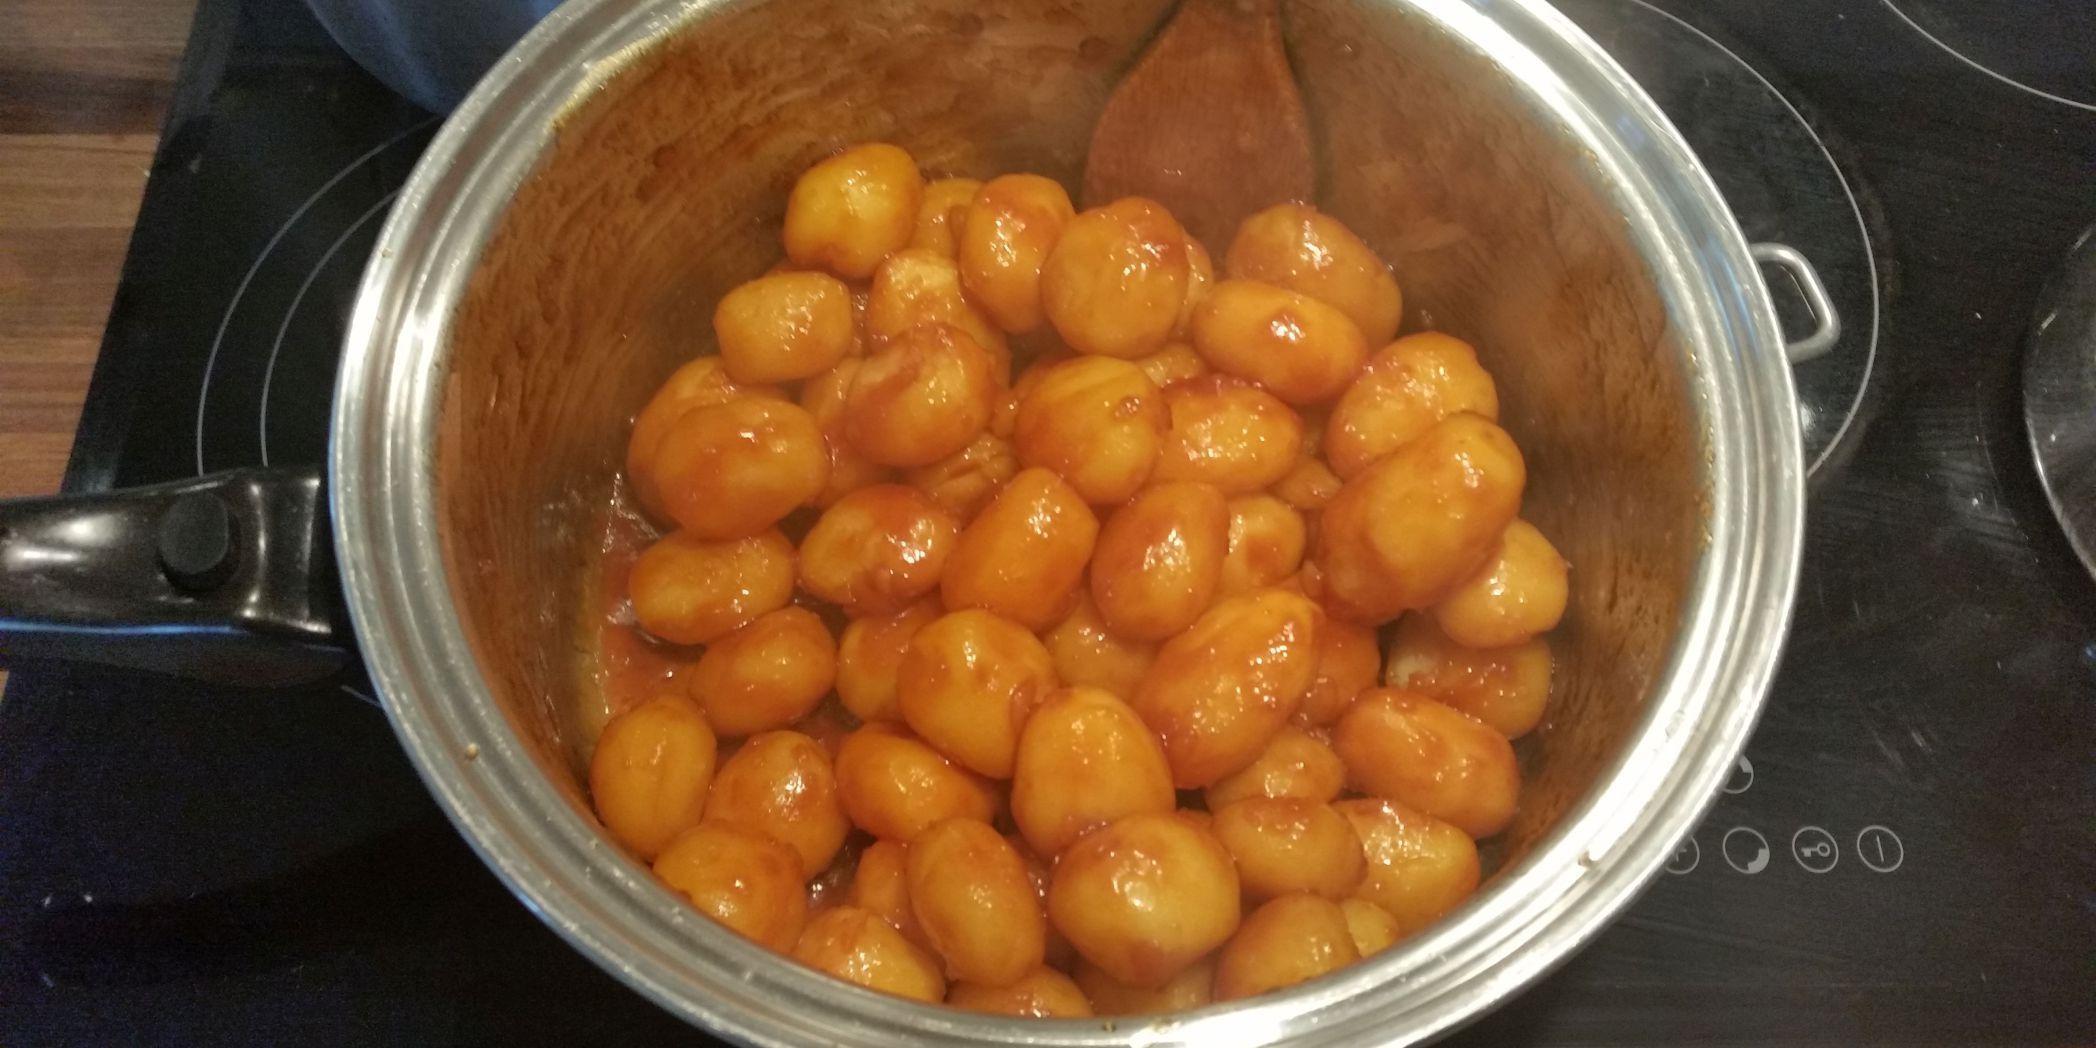 Brunede kartofler 08 #brunedekartofler Brunede kartofler 08 #brunedekartofler